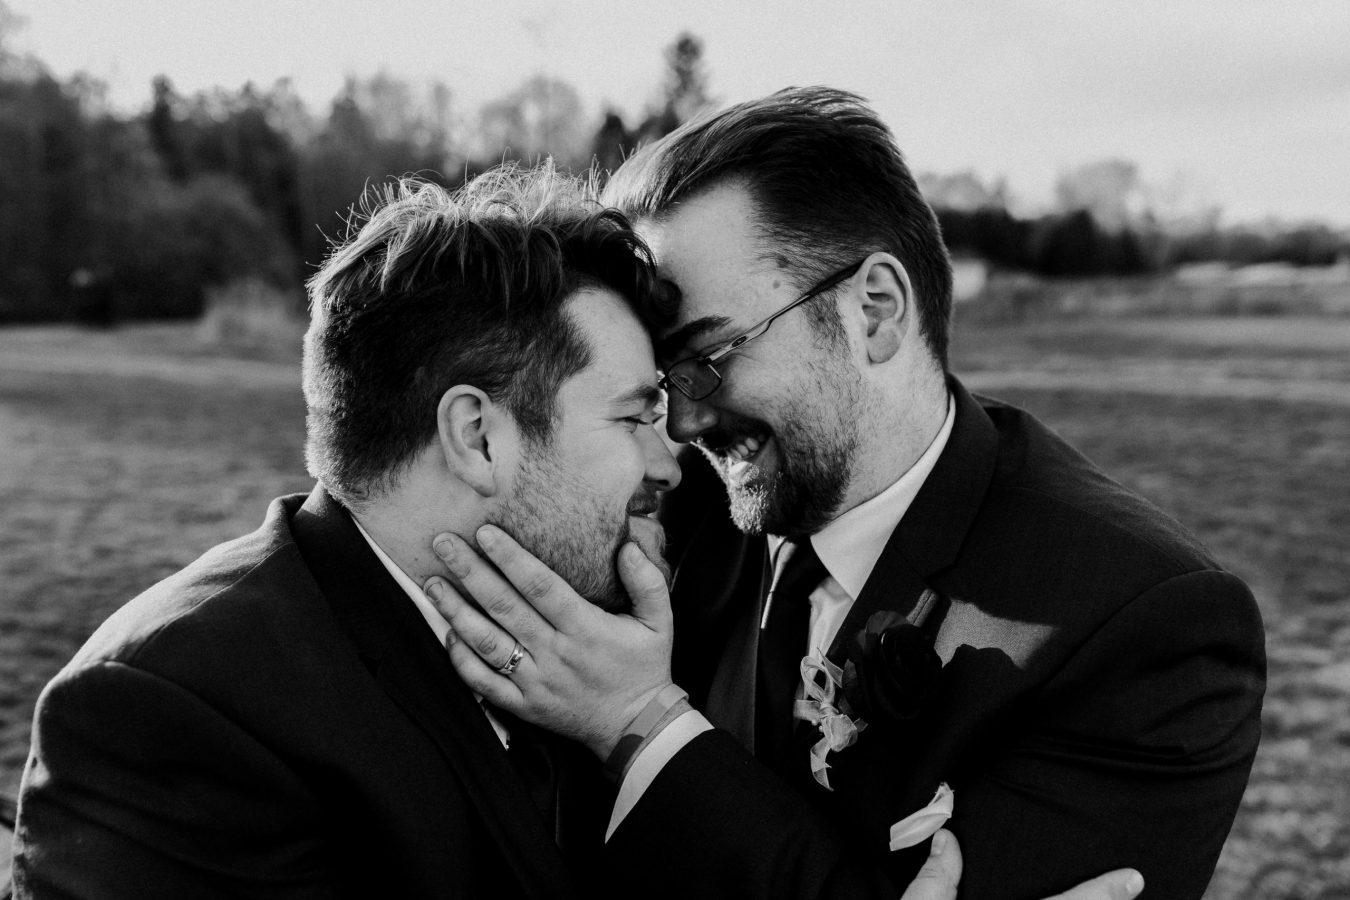 lgbtq wedding photographer, same sex wedding photographer, groom wedding, toronto wedding photographer